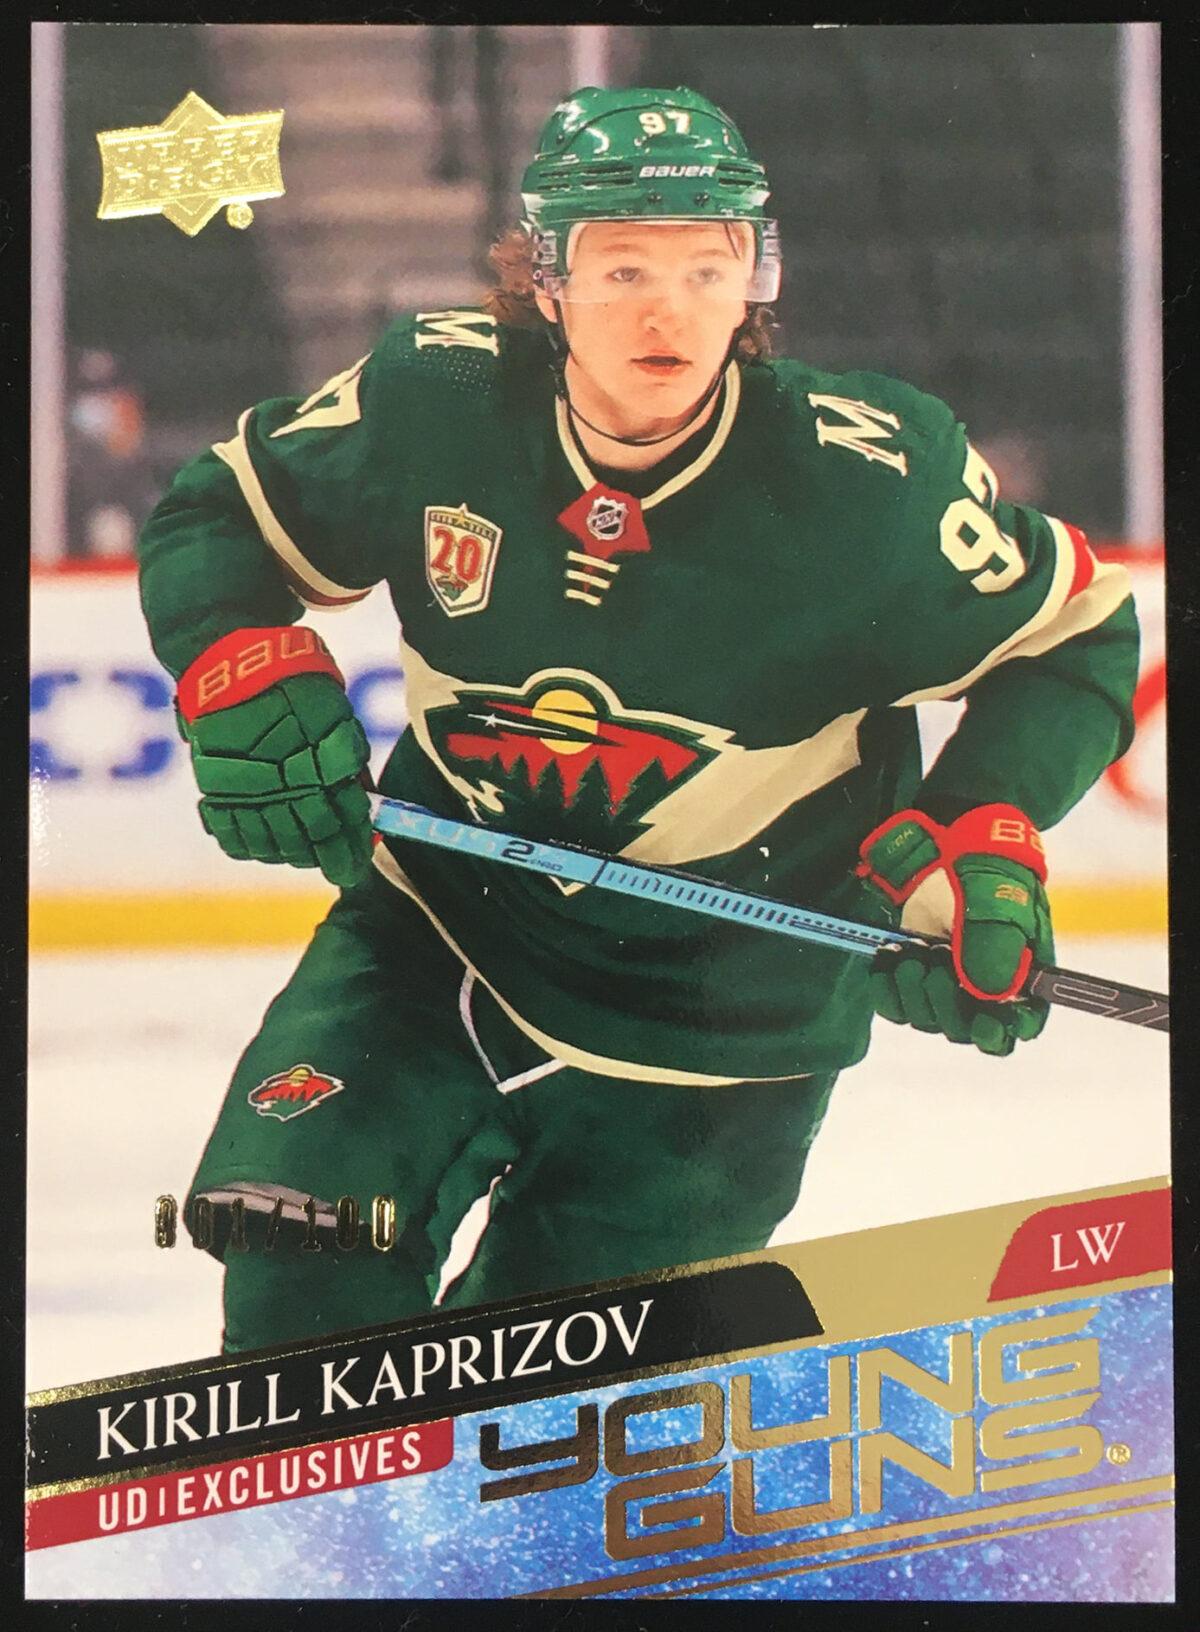 Kirill Kaprizov 2020-21 Upper Deck 2 Young Guns